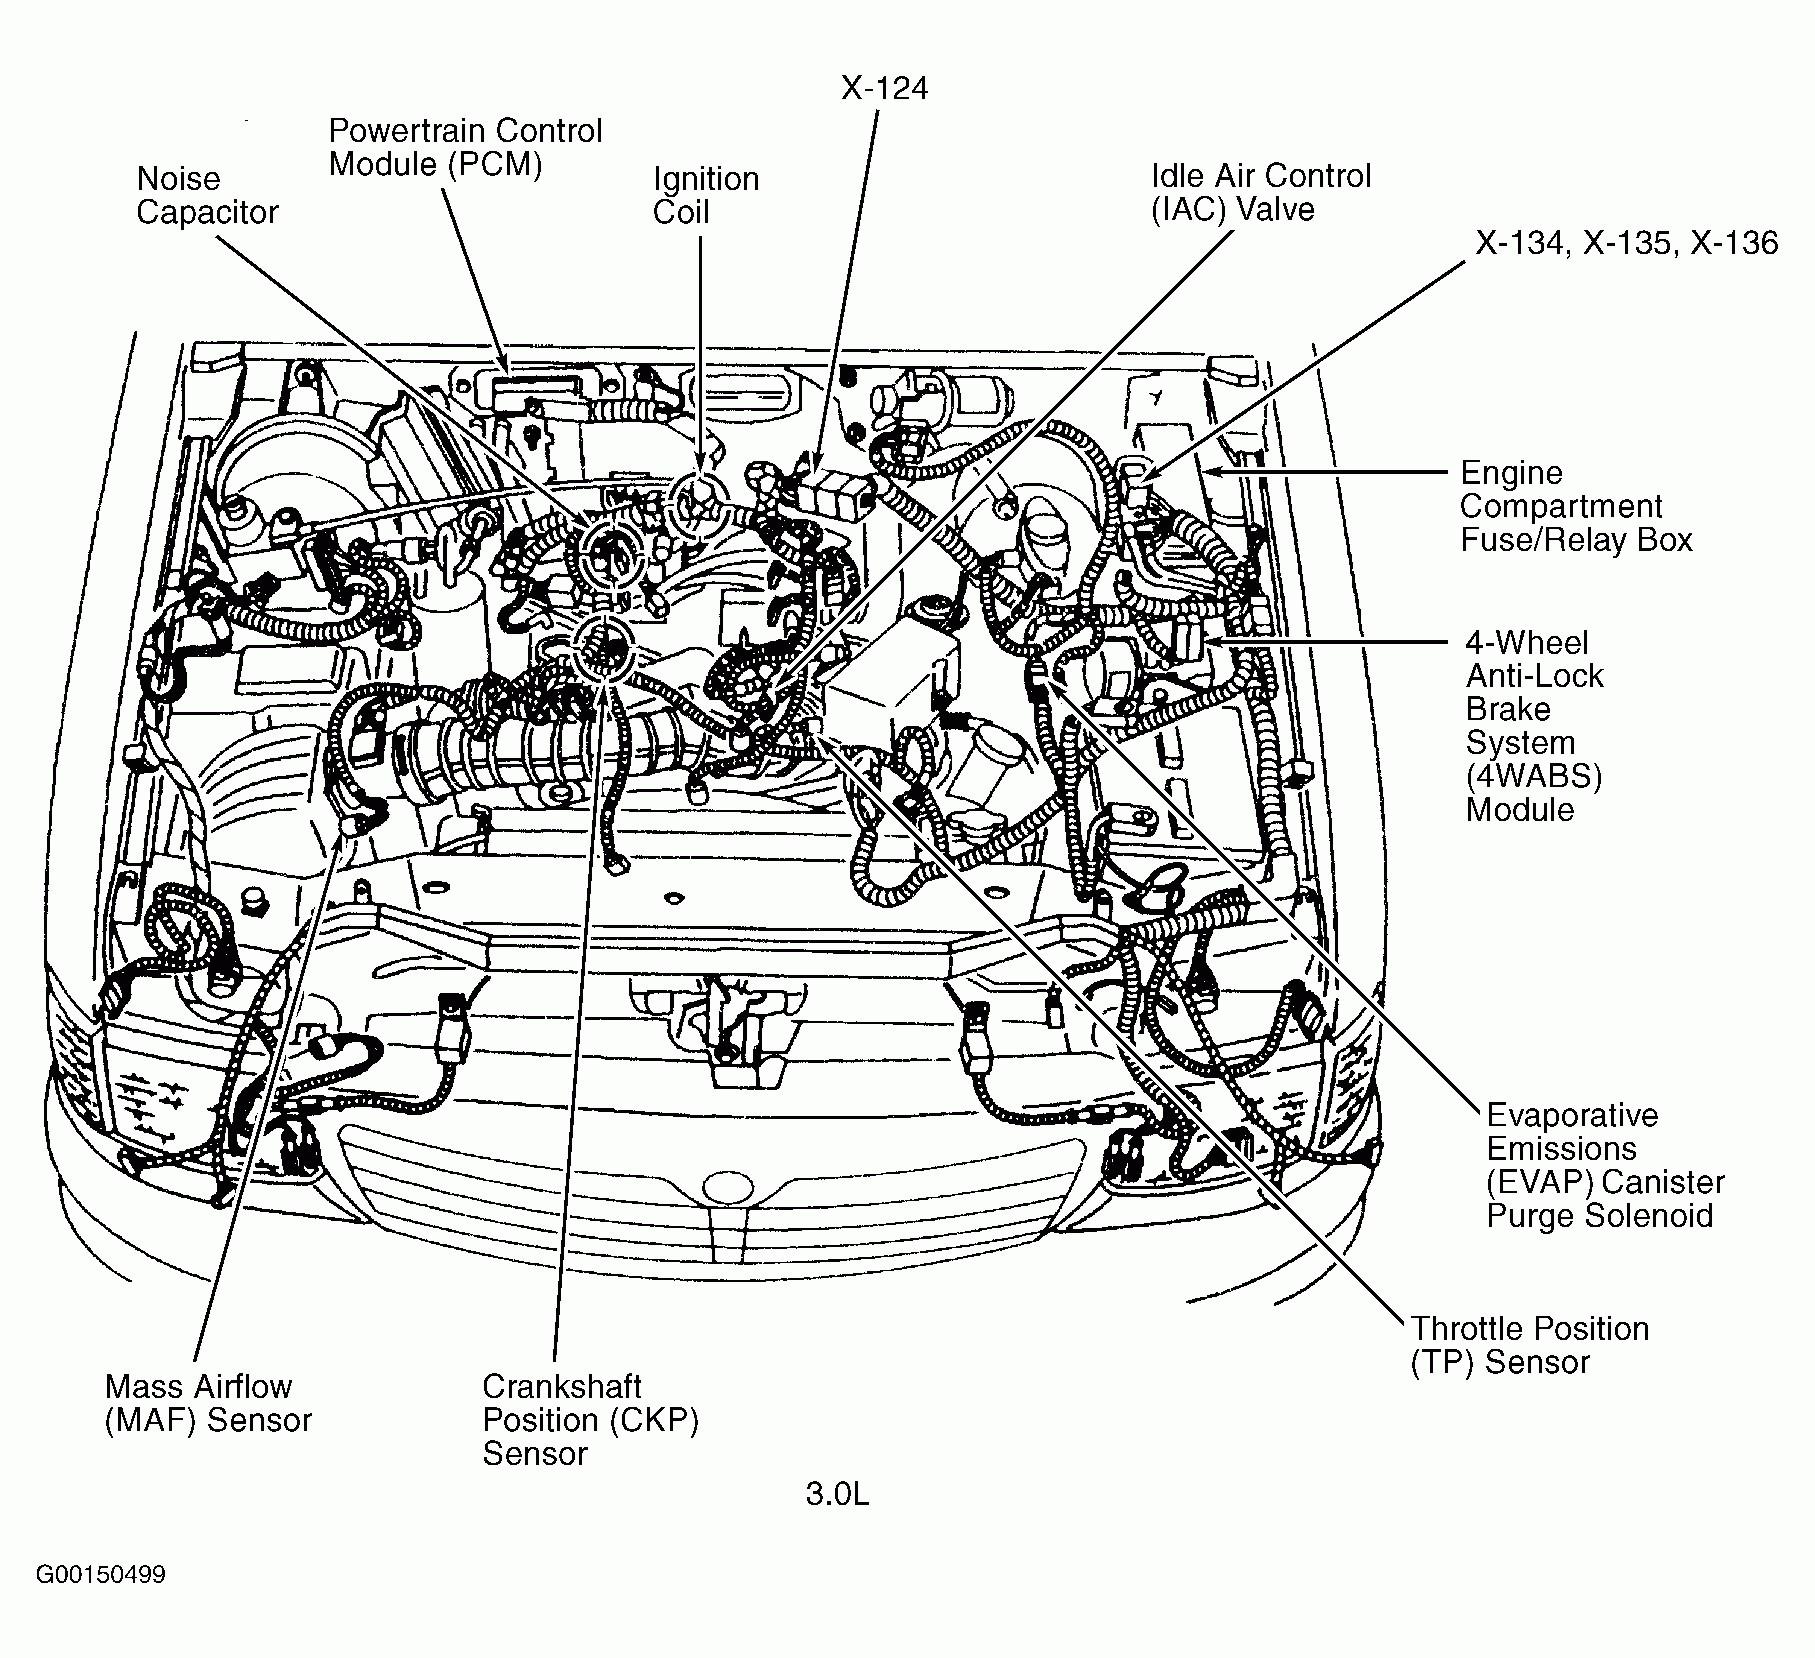 2003 Lincoln Navigator Engine Diagram Mazda 6 Engine Diagram Data Schematics Wiring Diagram • Of 2003 Lincoln Navigator Engine Diagram